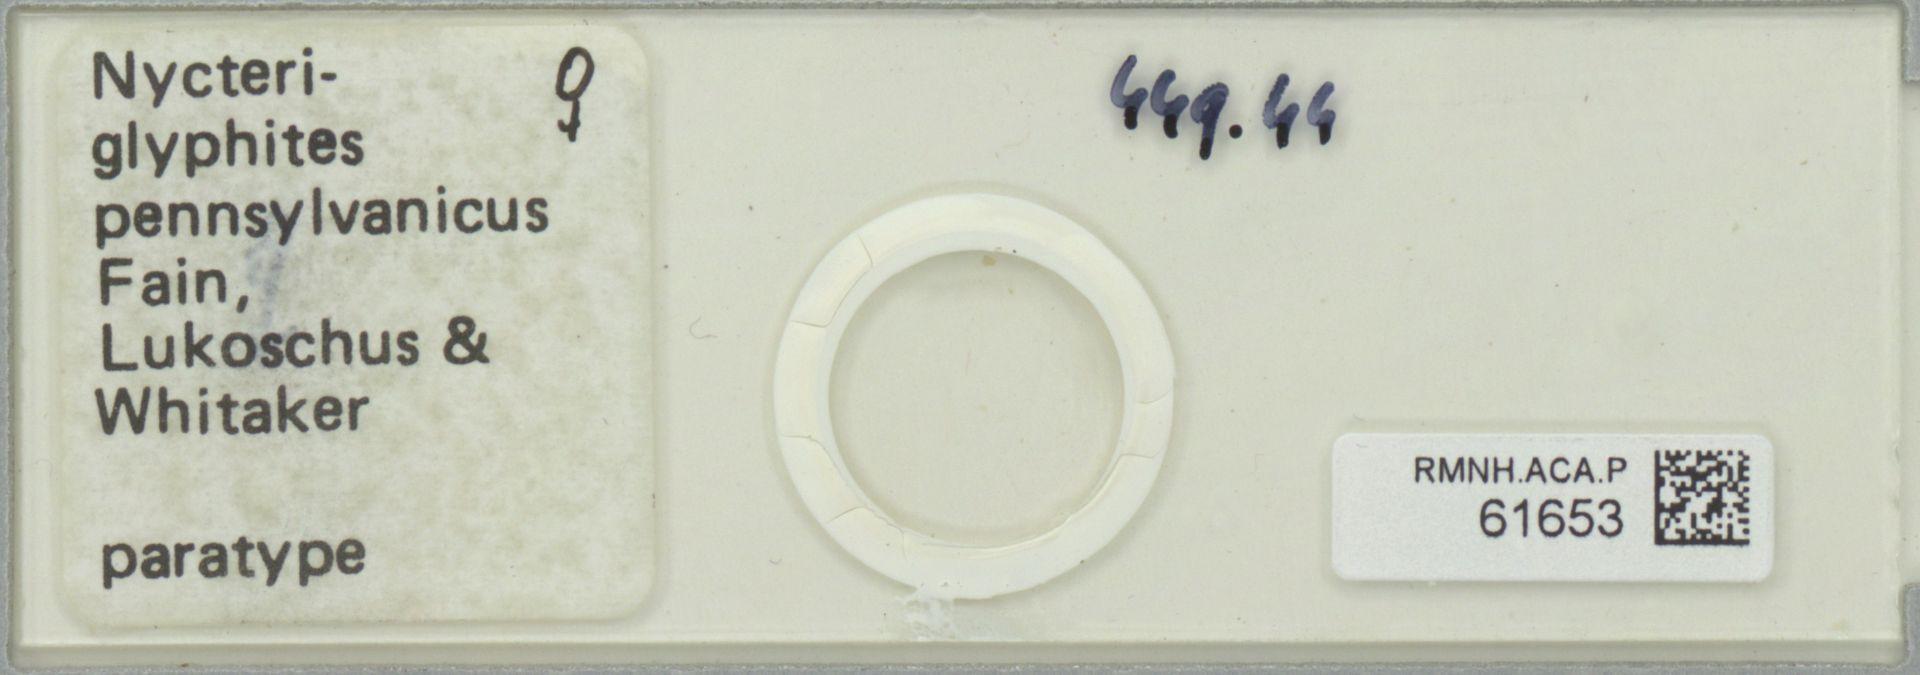 RMNH.ACA.P.61653 | Nycteriglyphites pennsylvanicus Fain, Lukoschus & Whitaker